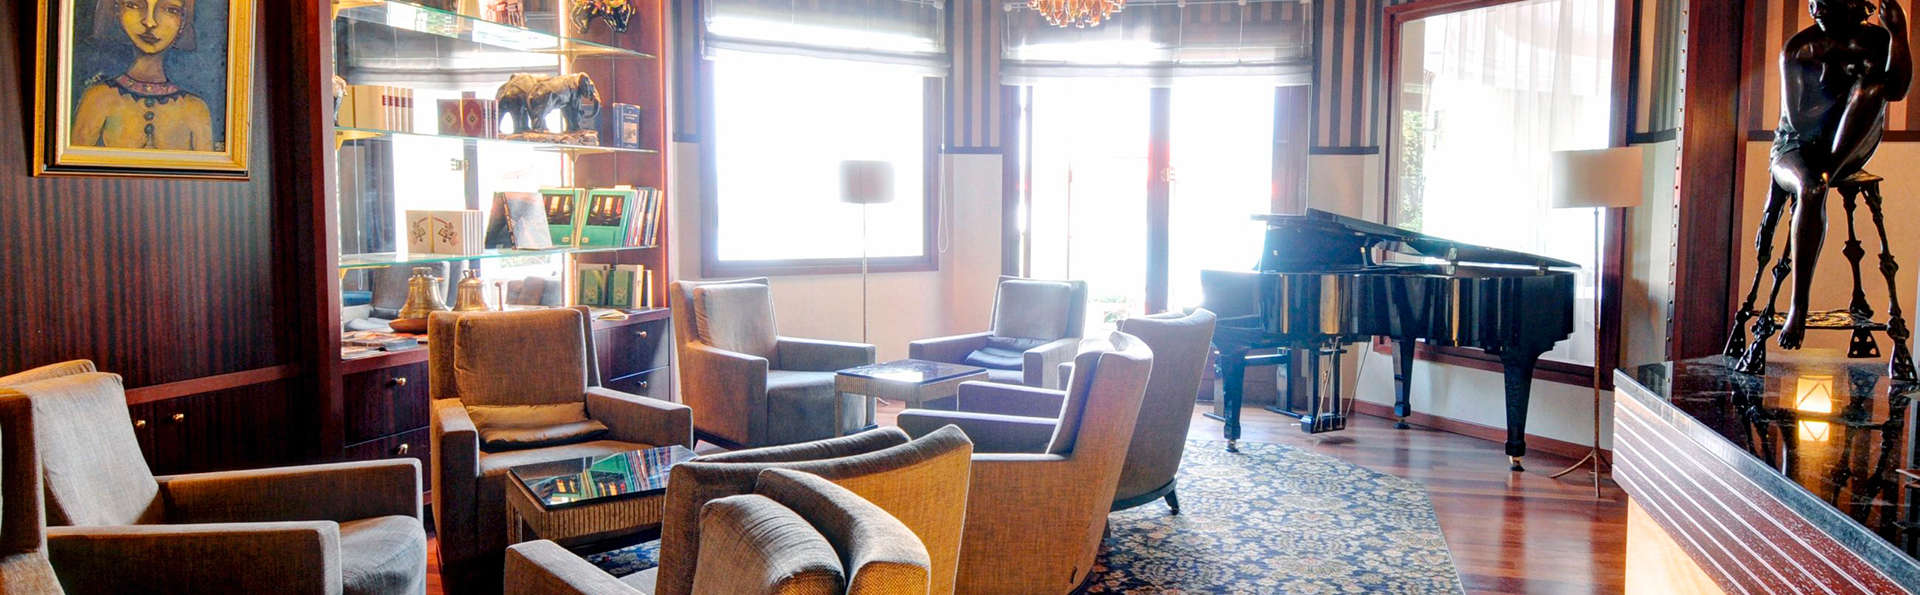 Hôtel les Trésoms Lake and Spa Resort - Annecy - EDIT_salon.jpg